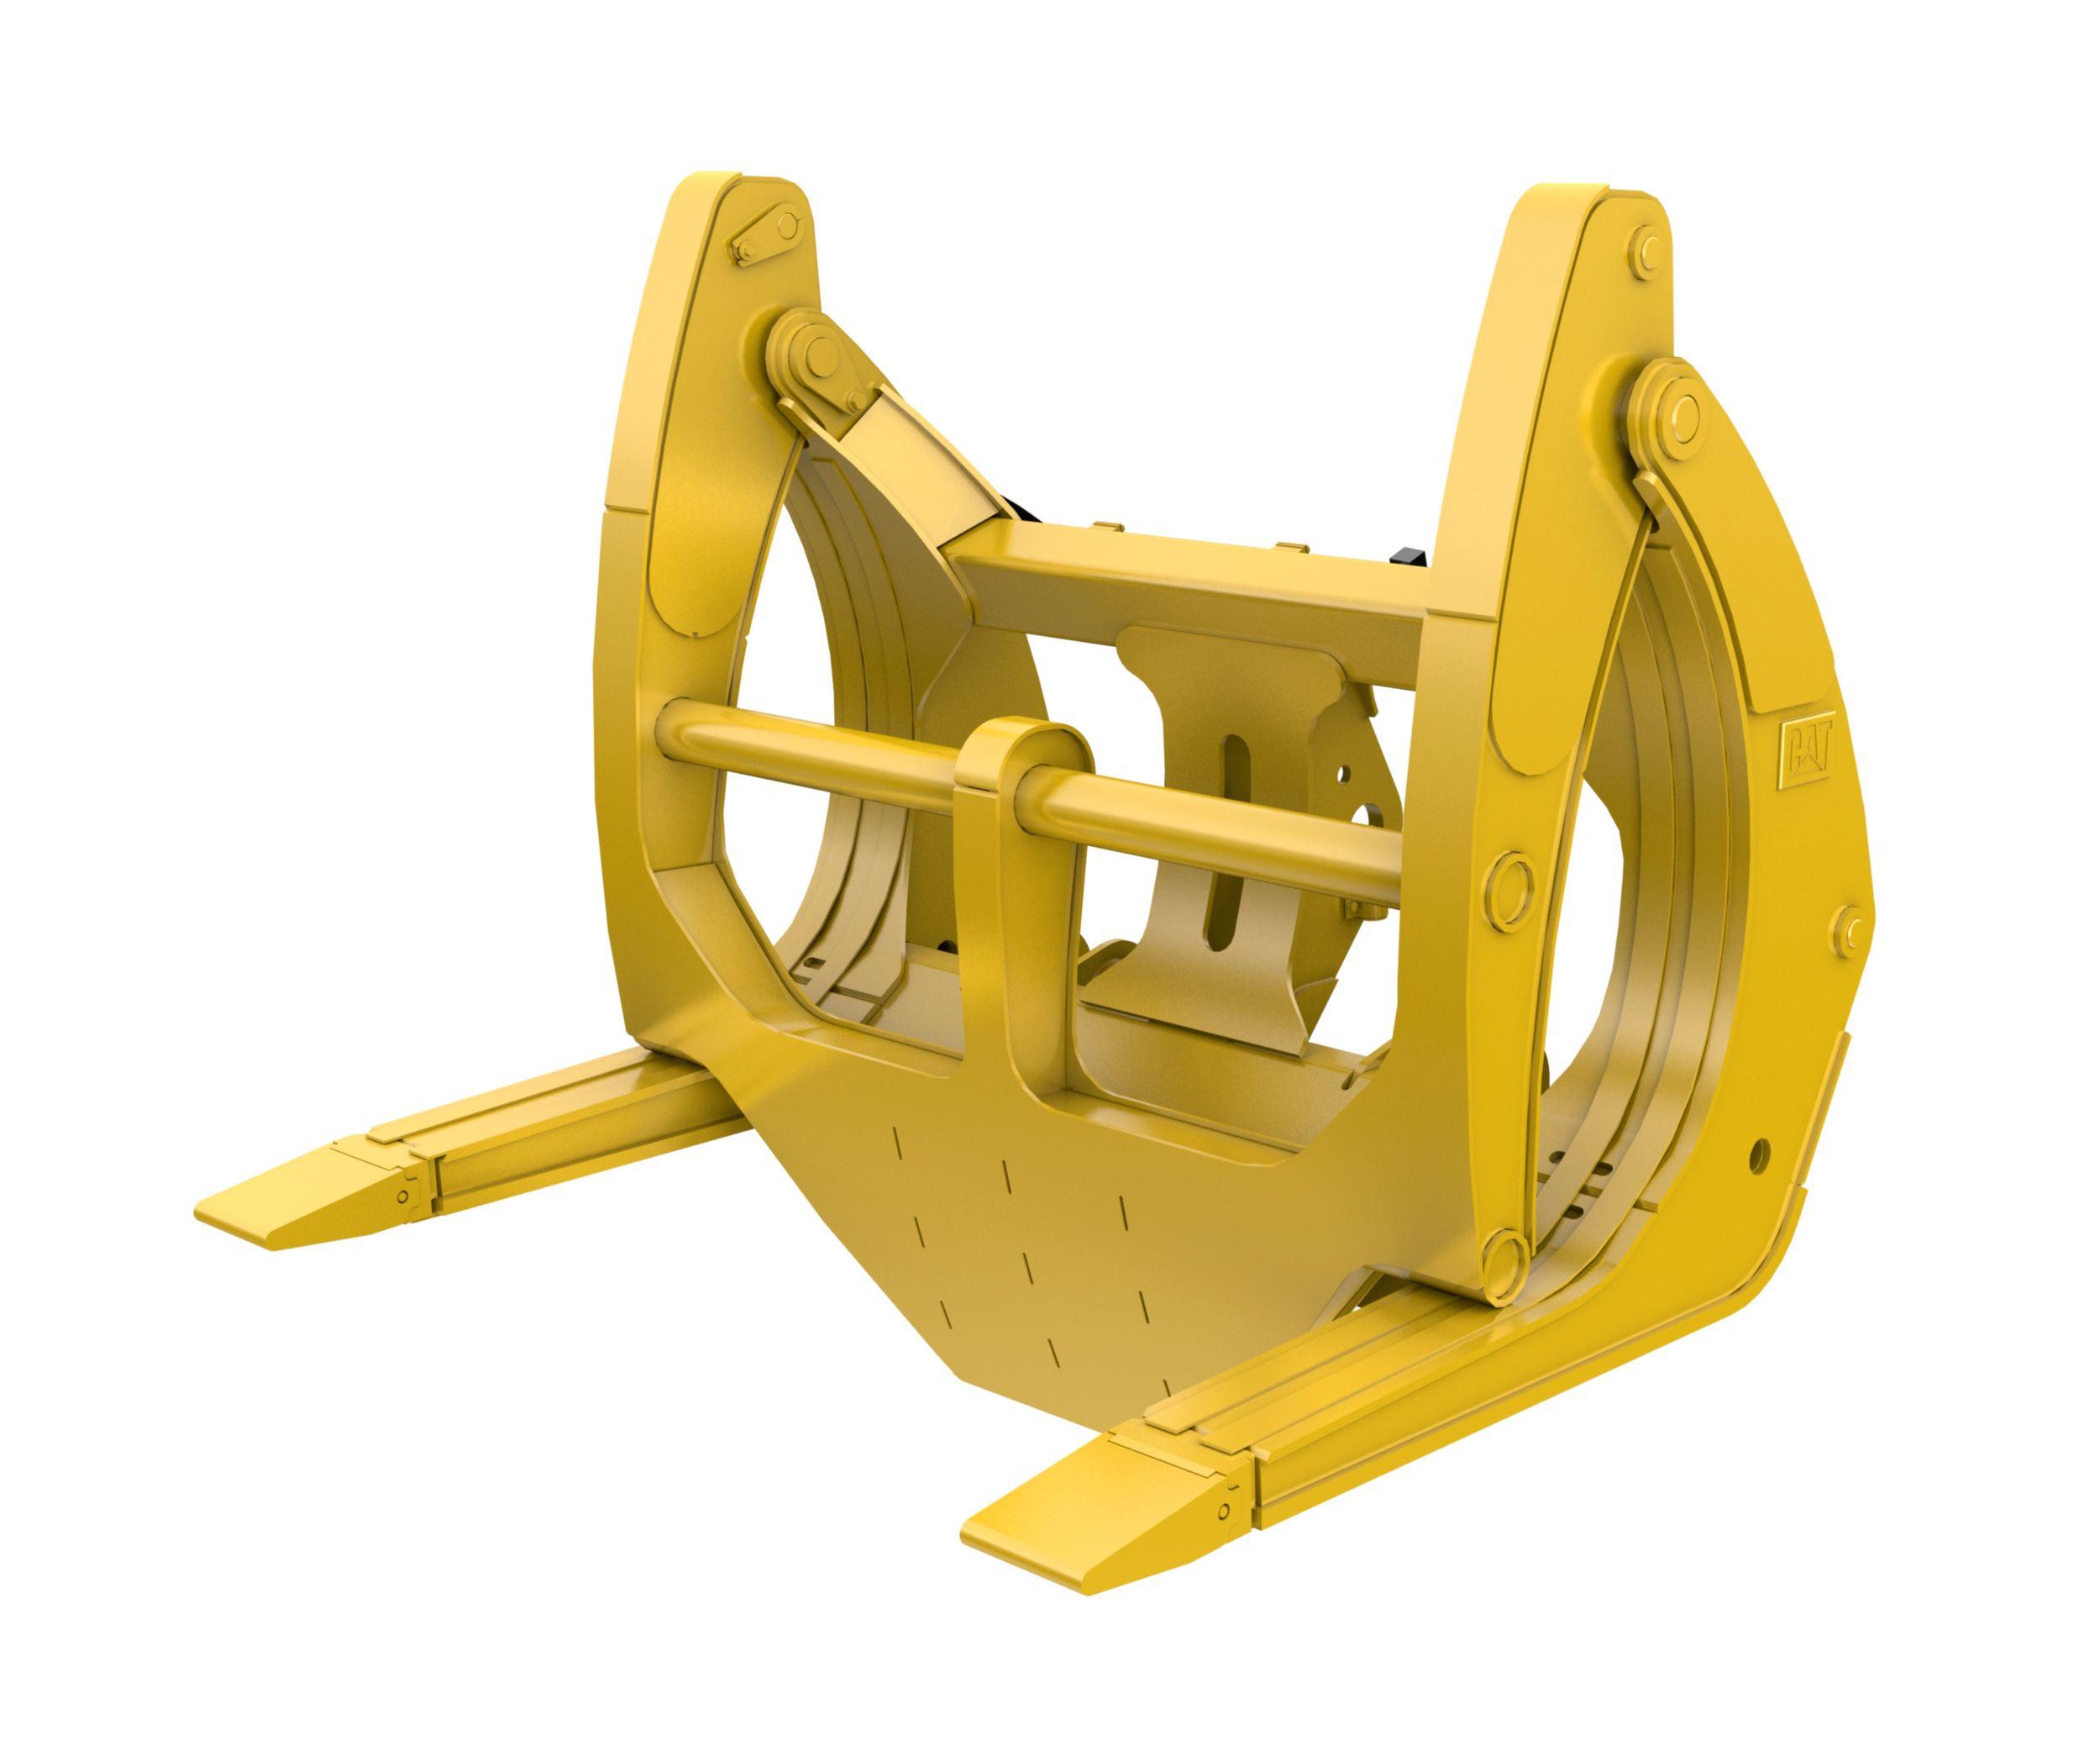 Cat 938m Wheel Loader Caterpillar